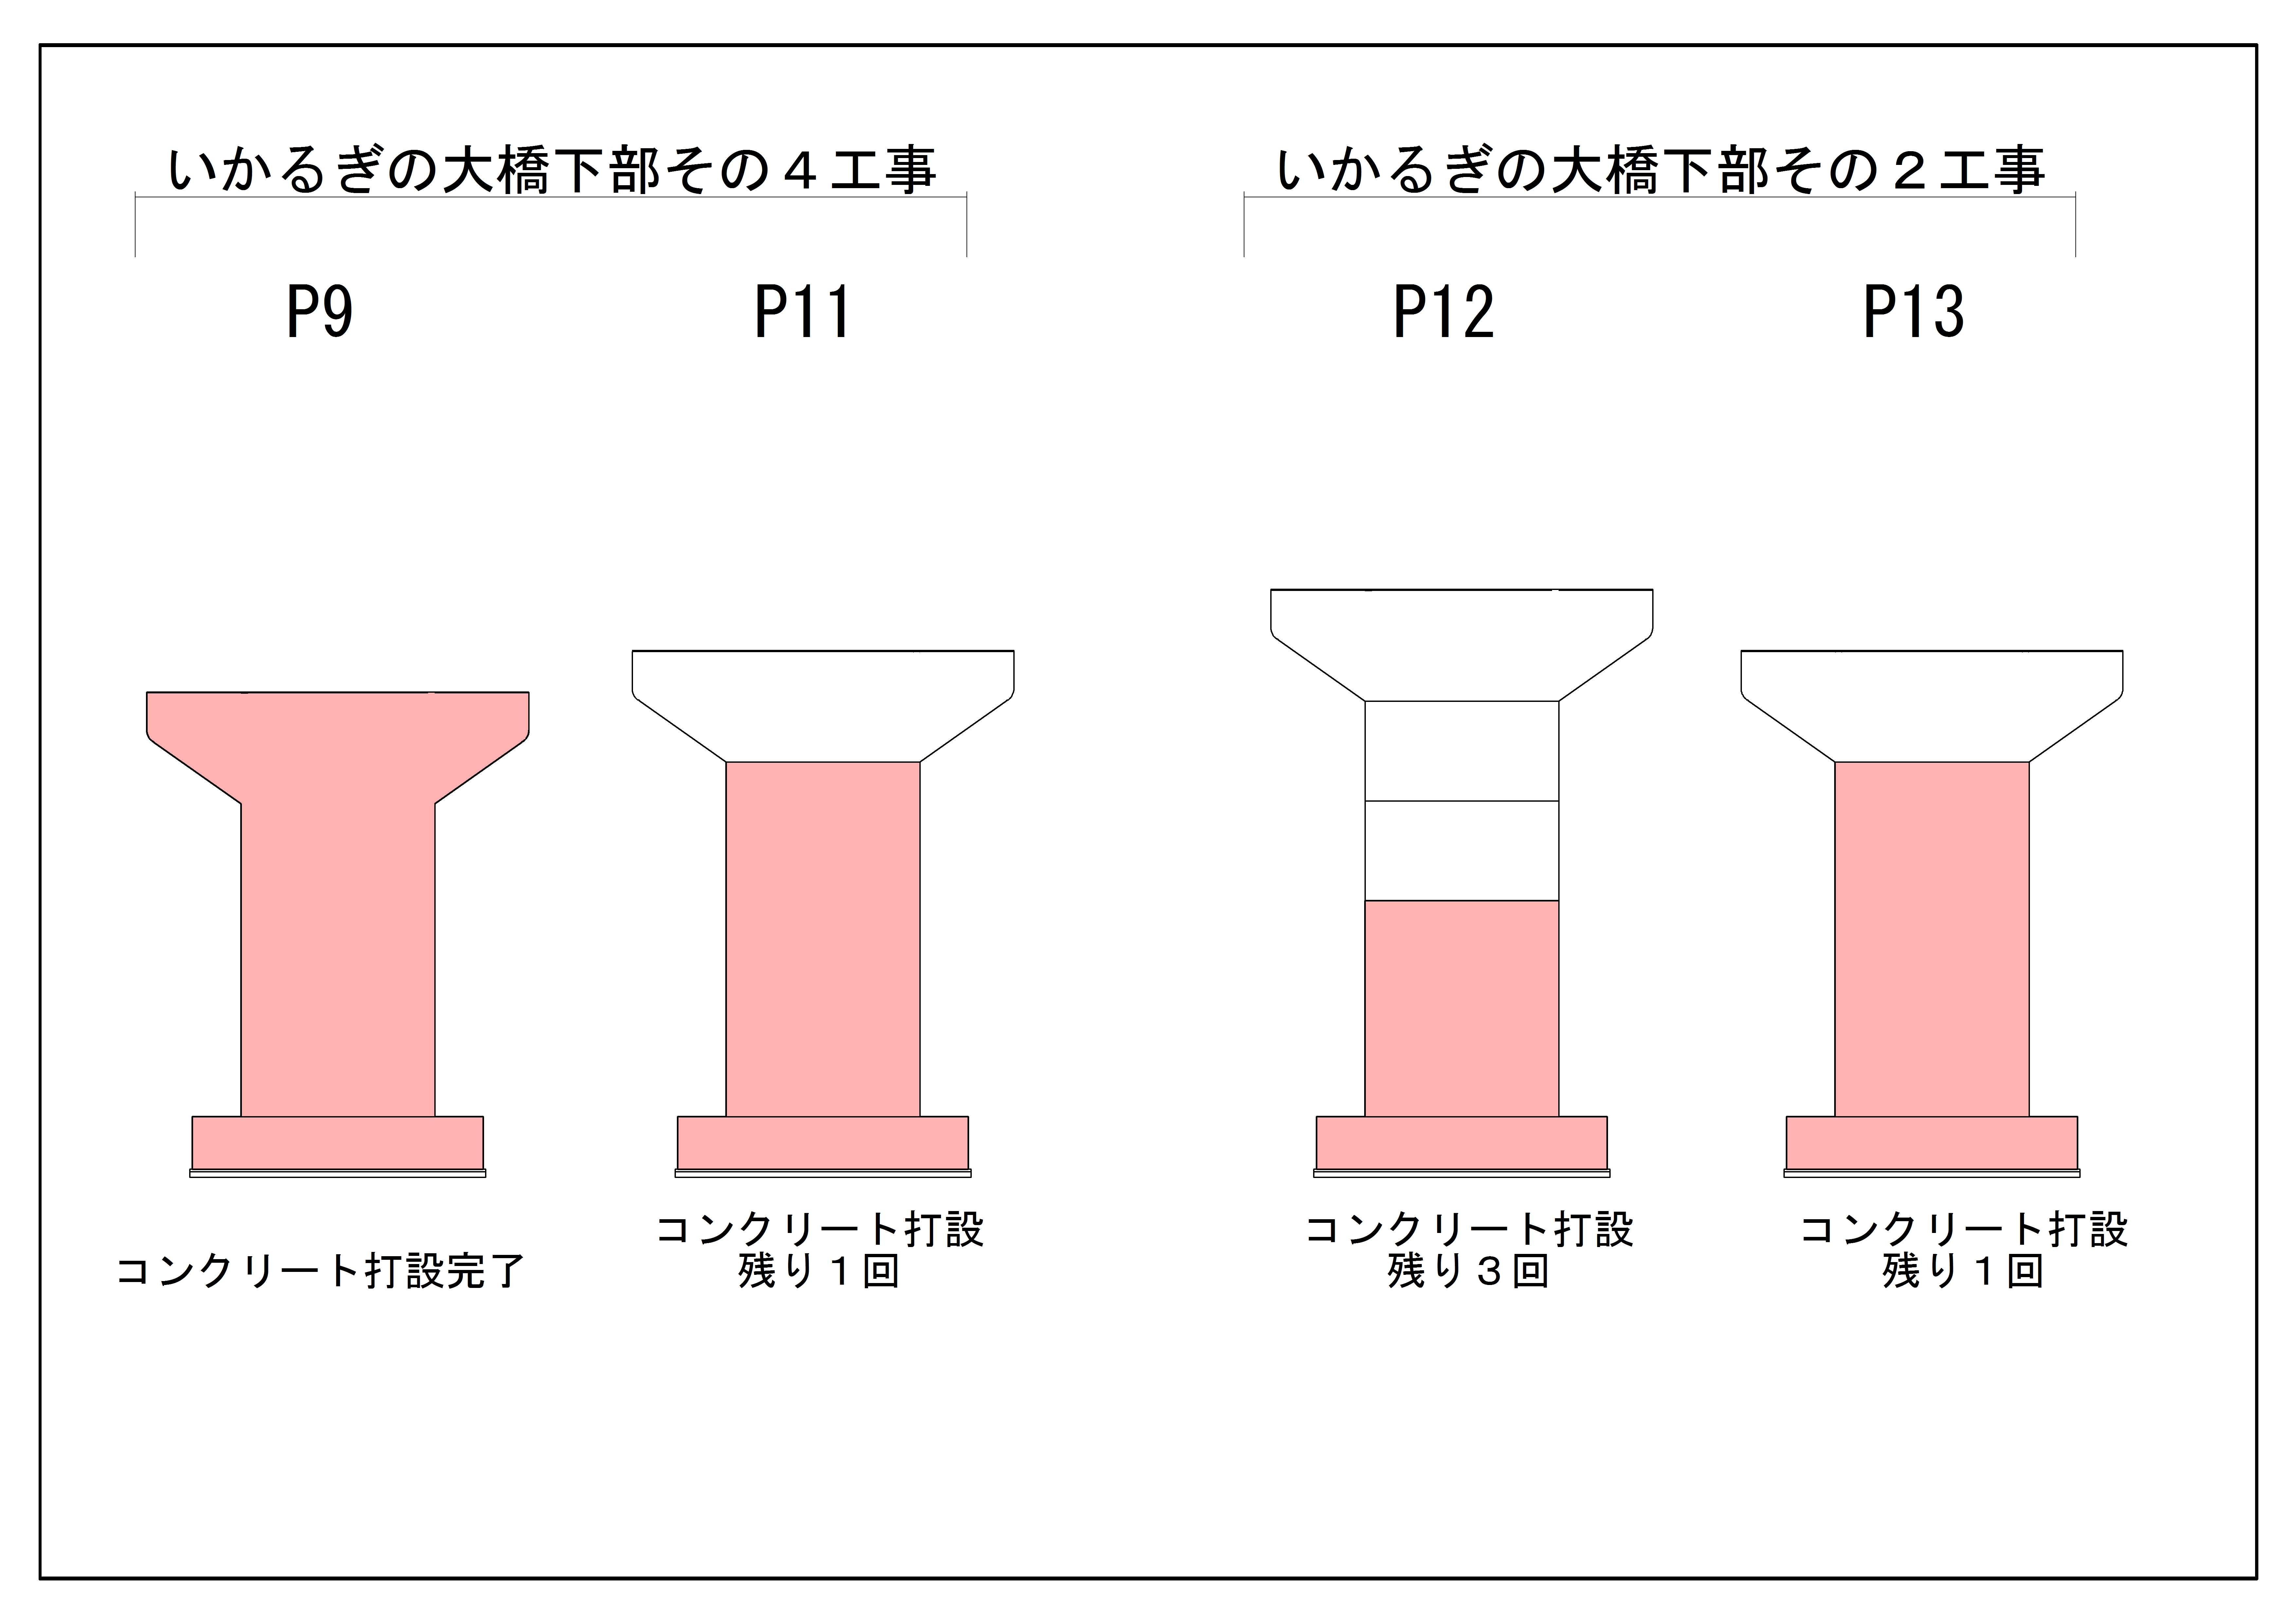 009_p12%e6%a9%8b%e8%84%9a%e9%85%8d%e7%ad%8b%e5%9b%b3%e3%81%9d%e3%81%ae3-d2rp10-3